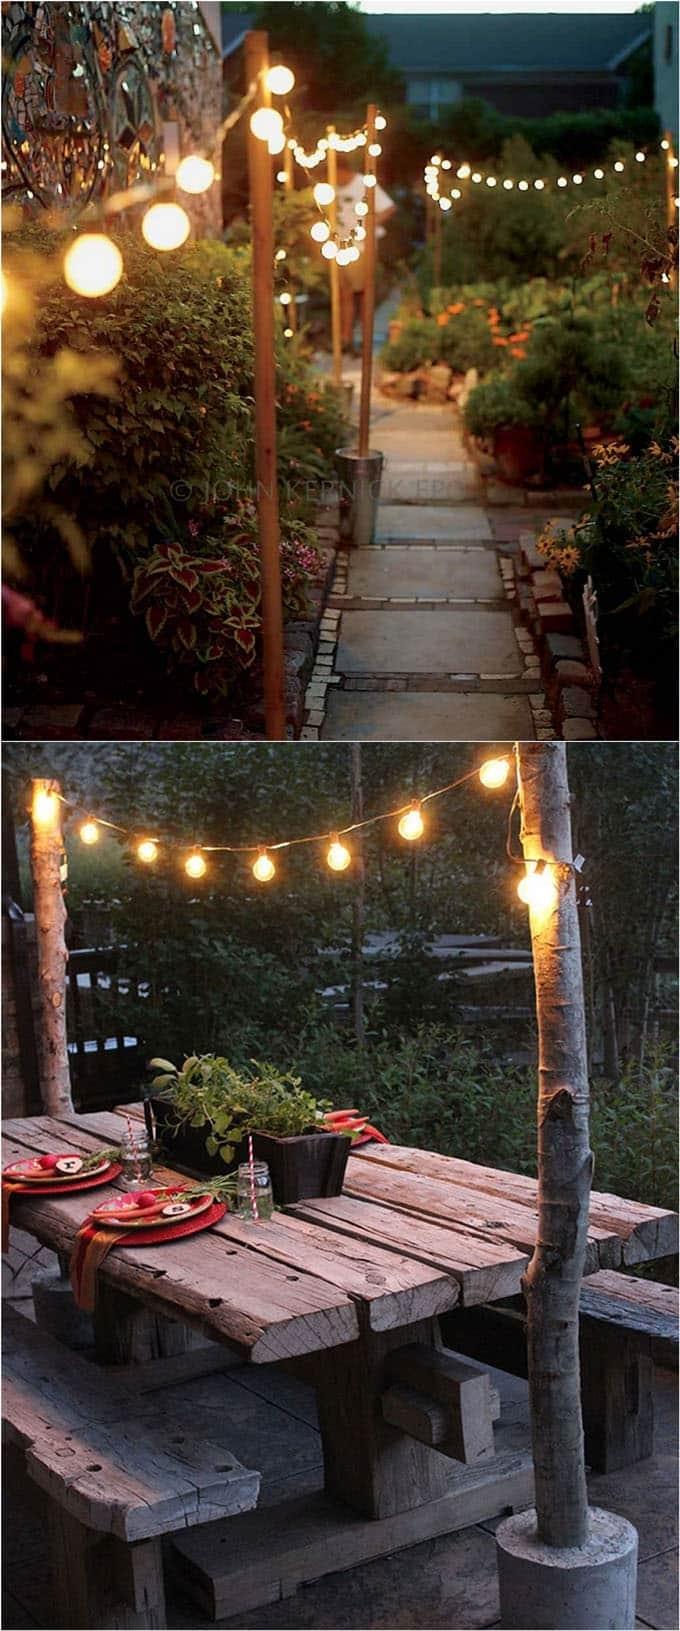 28 Stunning Diy Outdoor Lighting Ideas ( & So Easy! )   A Piece Of Regarding Diy Outdoor Lanterns (Photo 1 of 20)